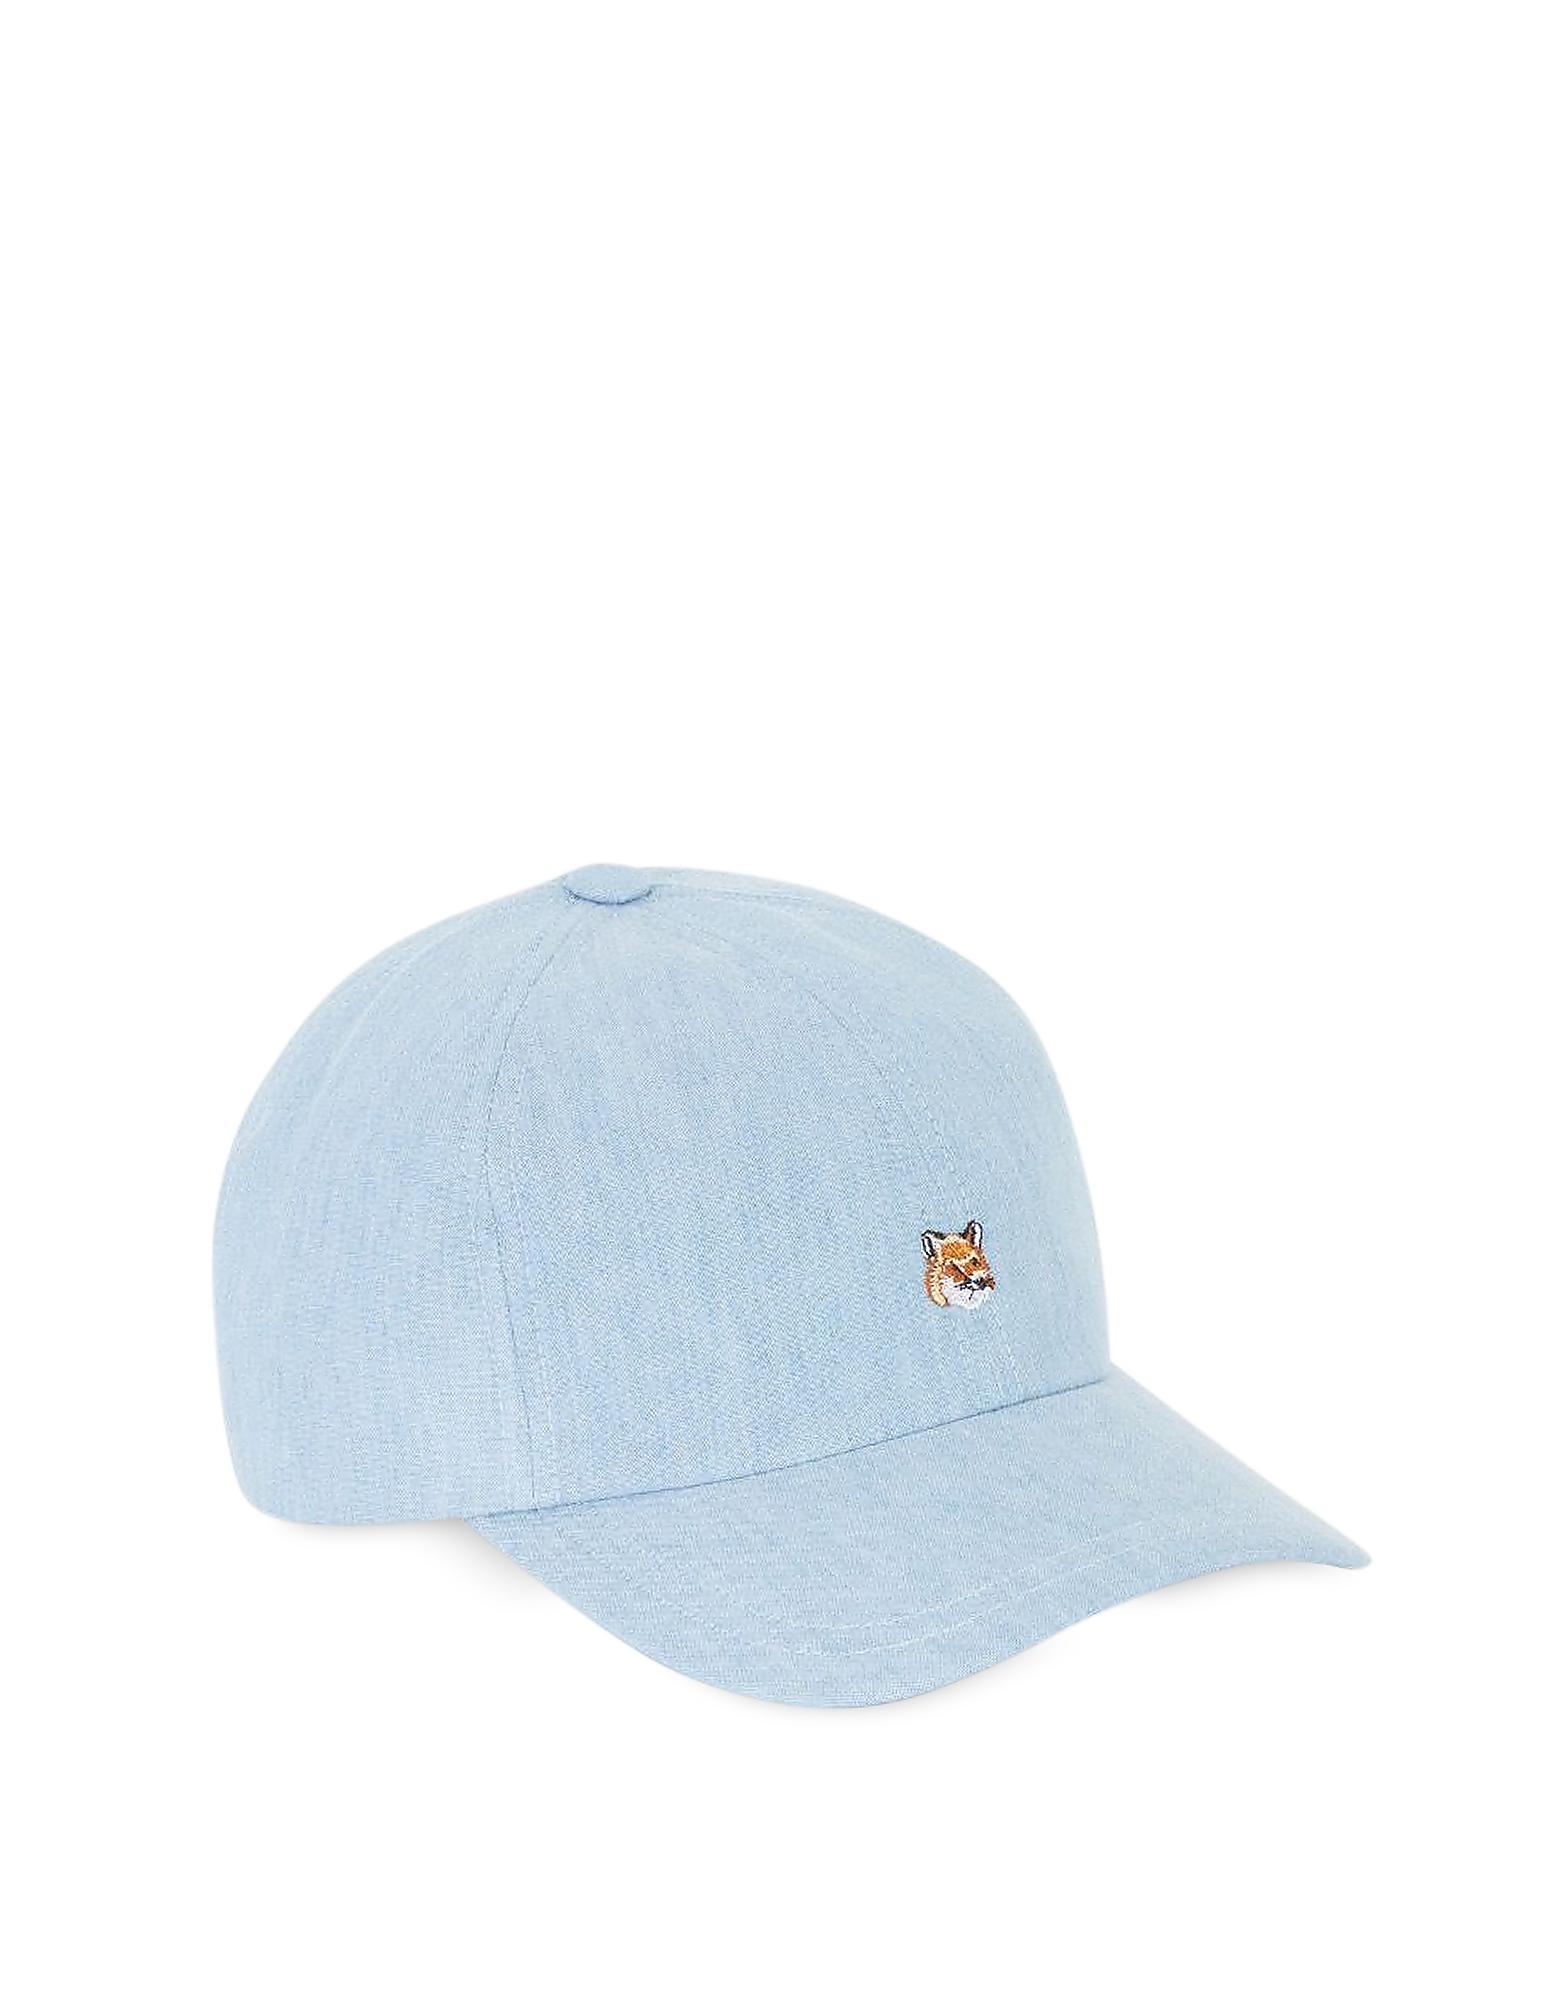 Chambray Baseball Cap w/ Small Fox Head Embroidery